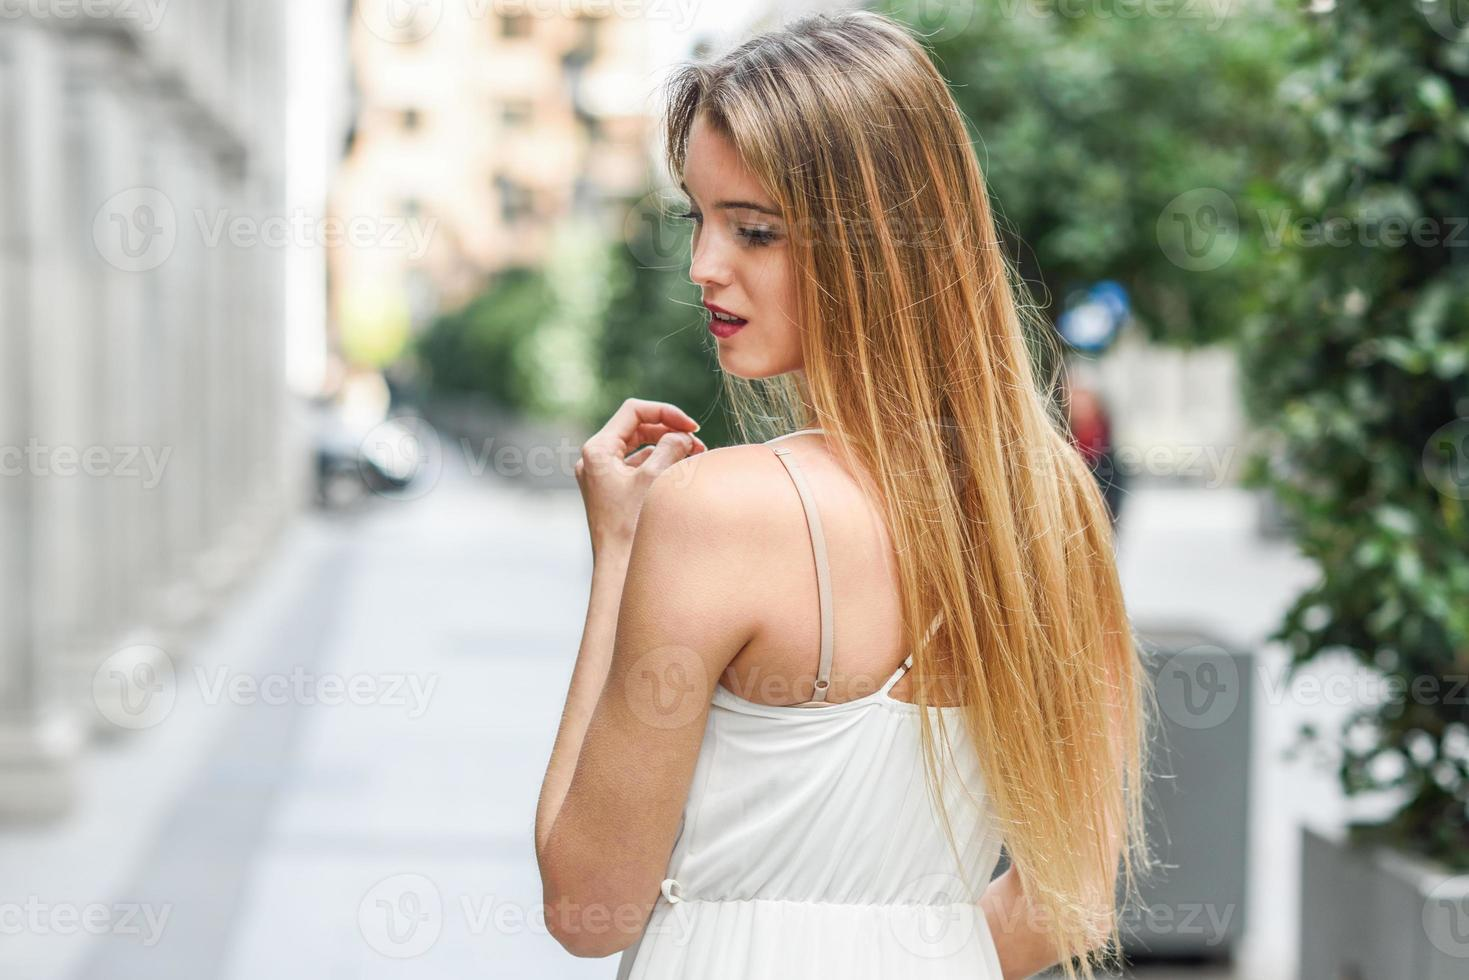 belle fille blonde en milieu urbain photo